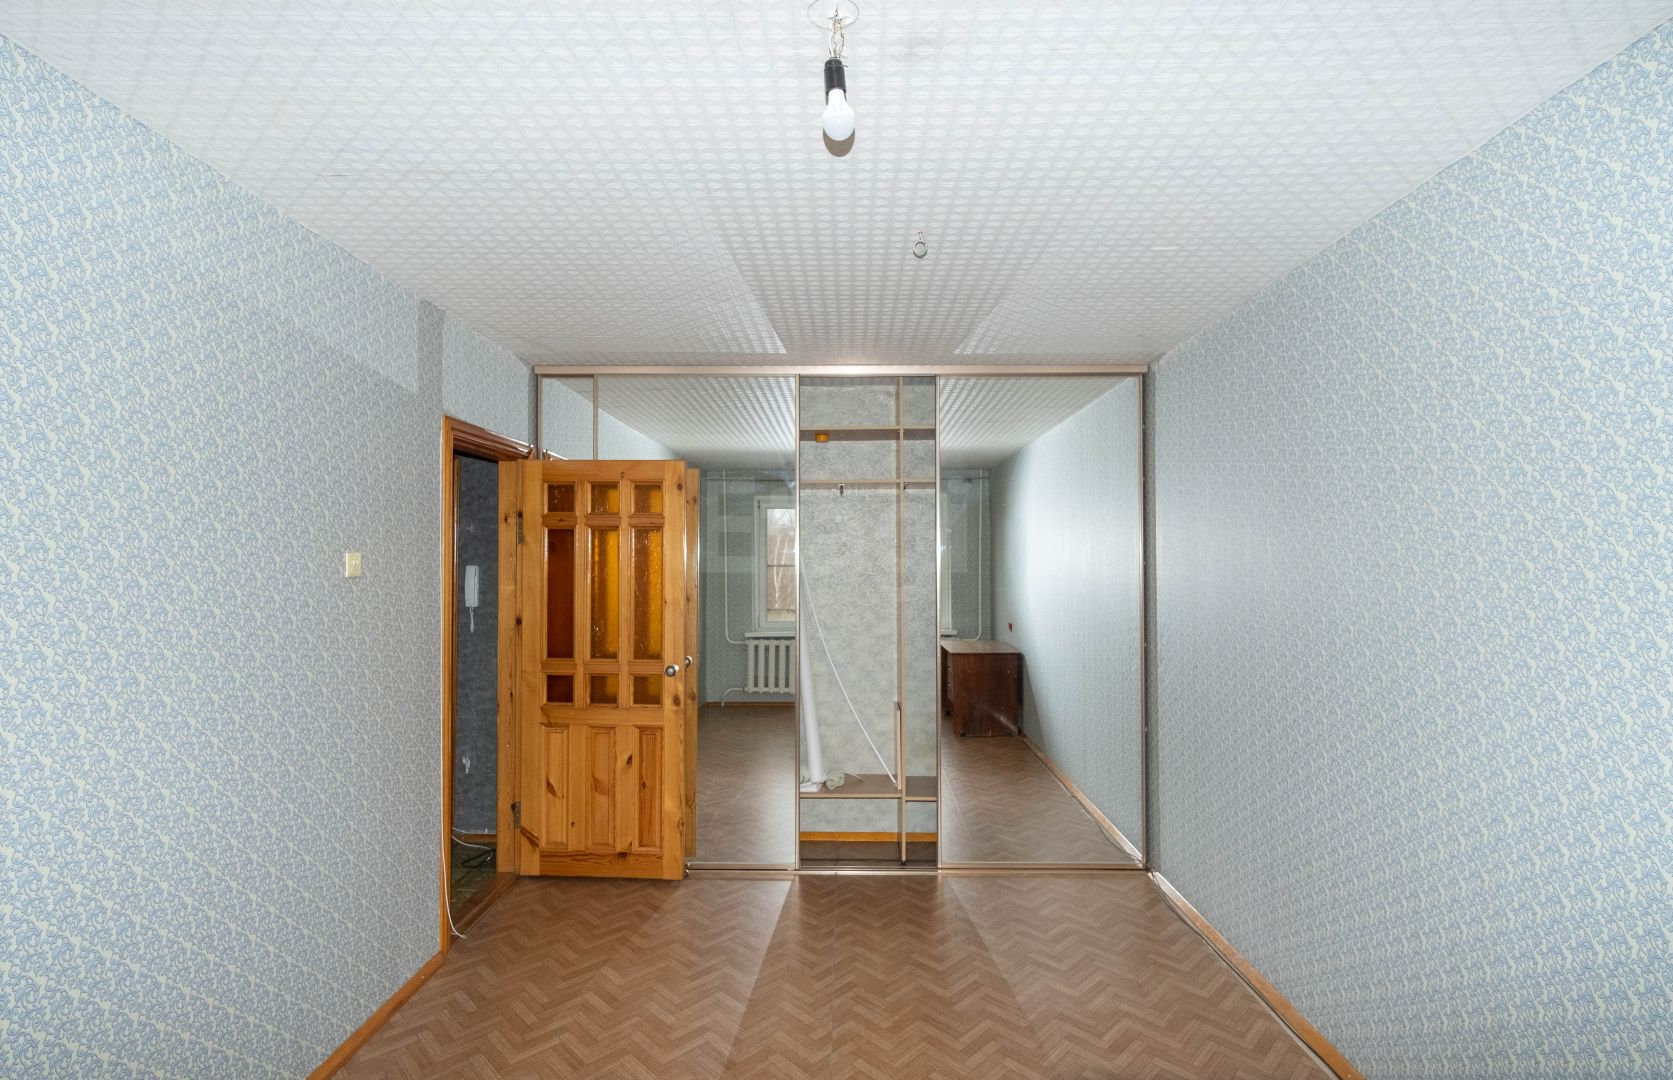 Продажа 1-комнатной квартиры, Златоуст, 5-я линия пр-та им. Ю.А. Гагарина,  5а